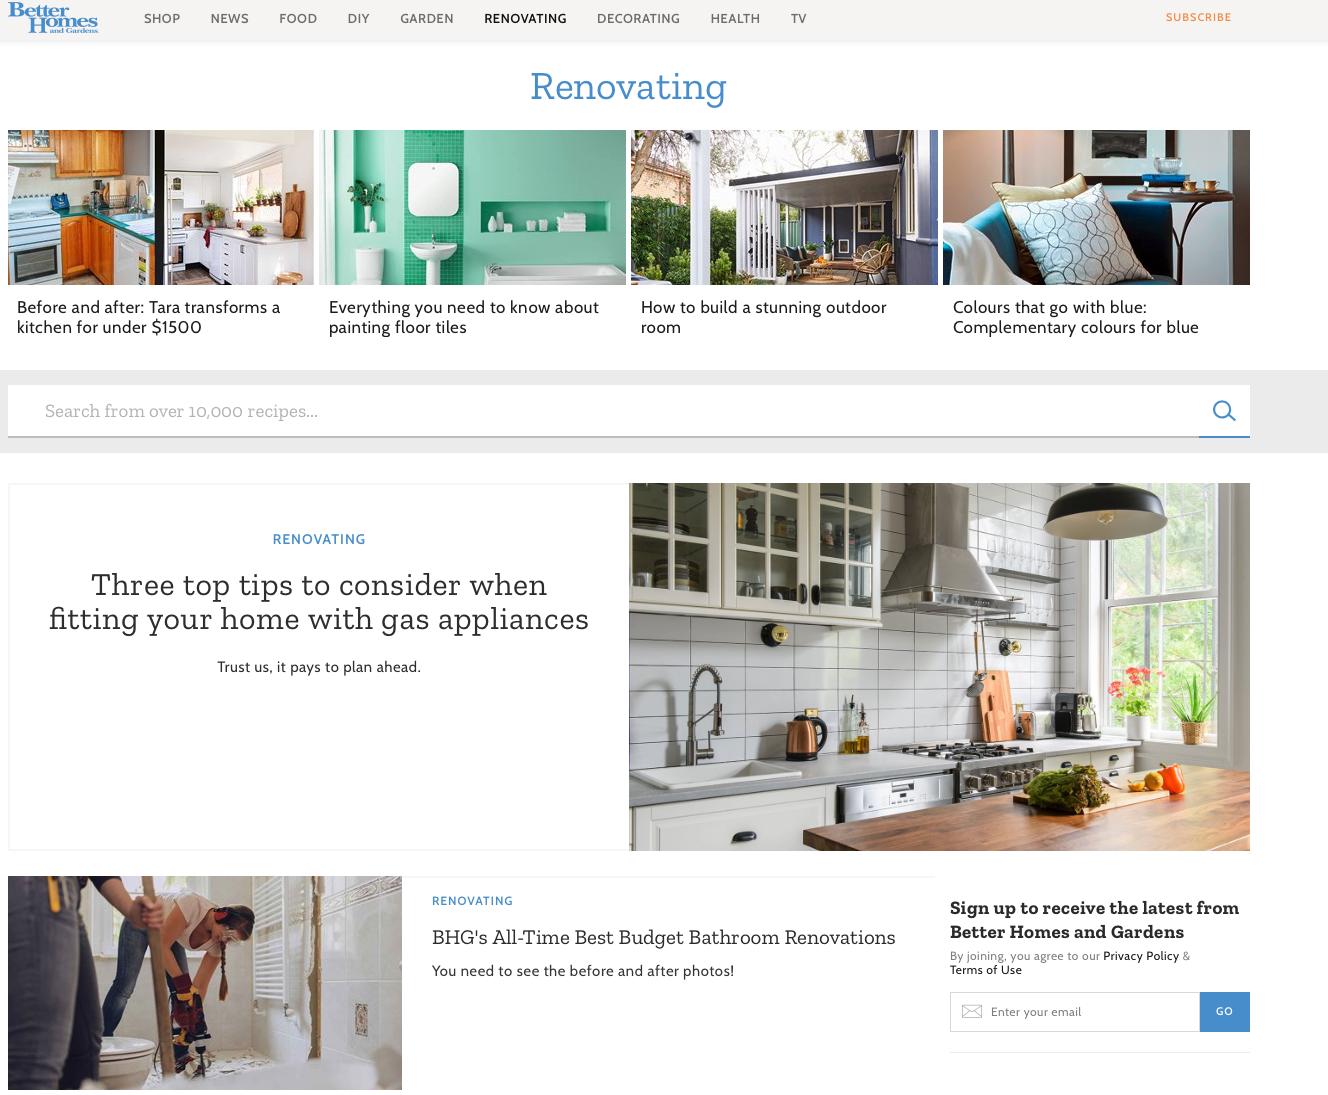 better homes and gardens website screenshot showing kitchen renovations blogs